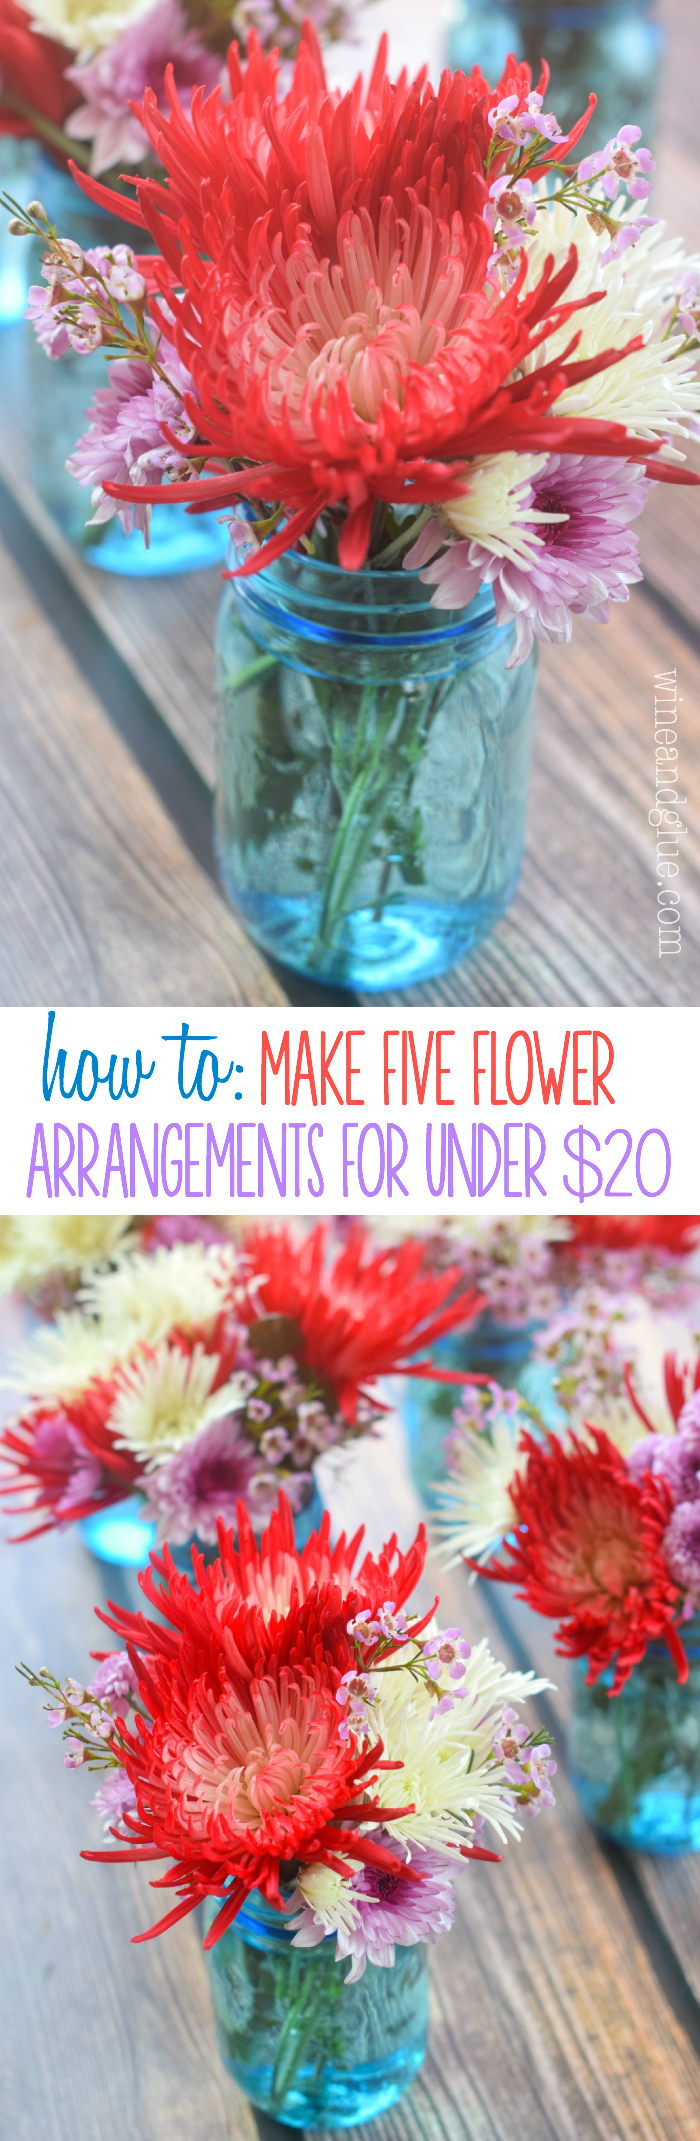 Make Five Flower Arrangements for Less than Twenty Dollars